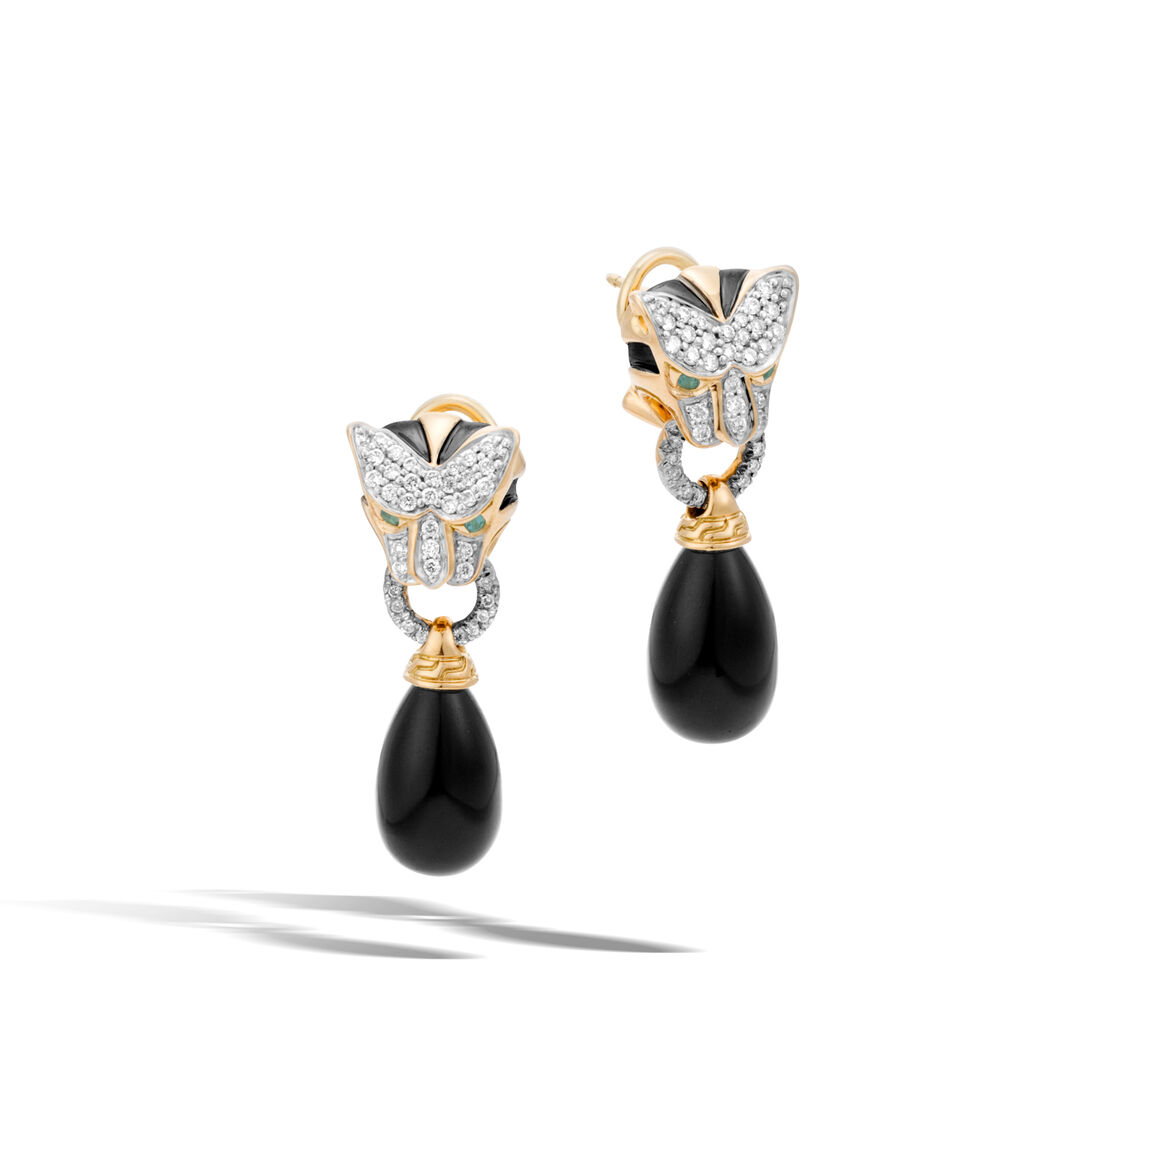 Legends Macan Drop Earring, 18K Gold, Gemstone, Diamonds